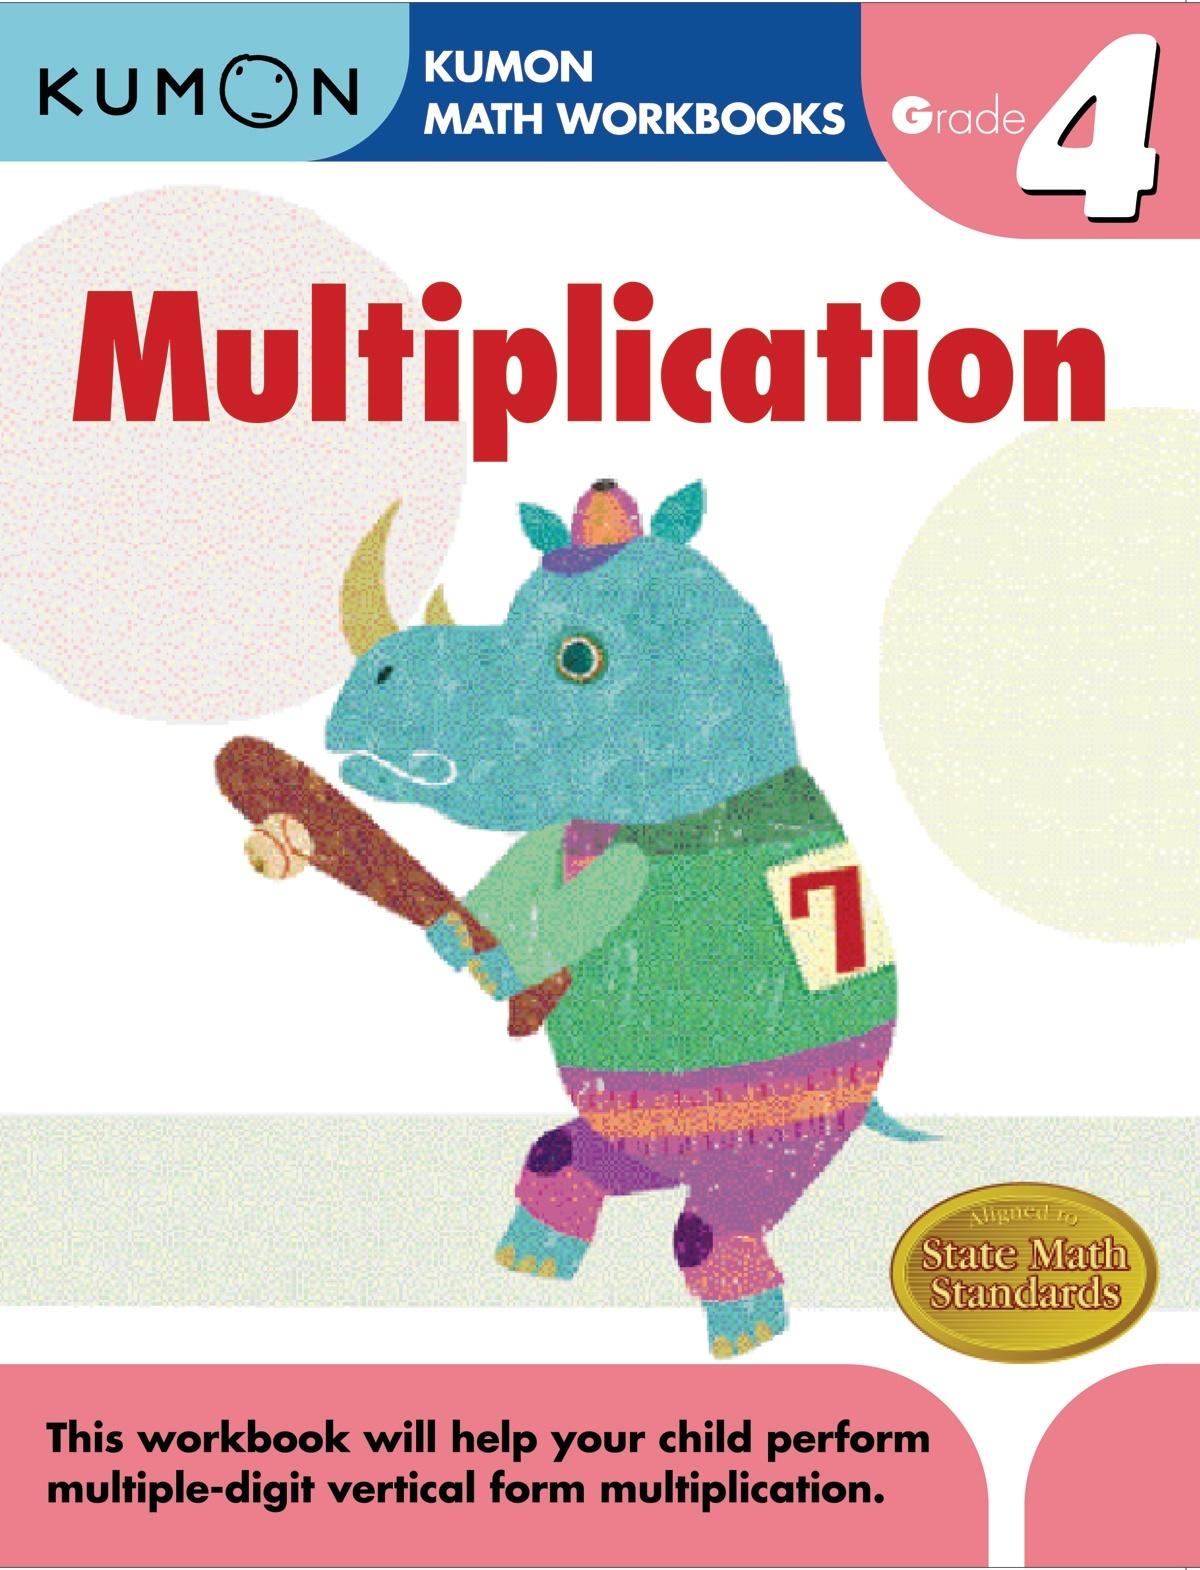 Kumon Multiplication Grade 4